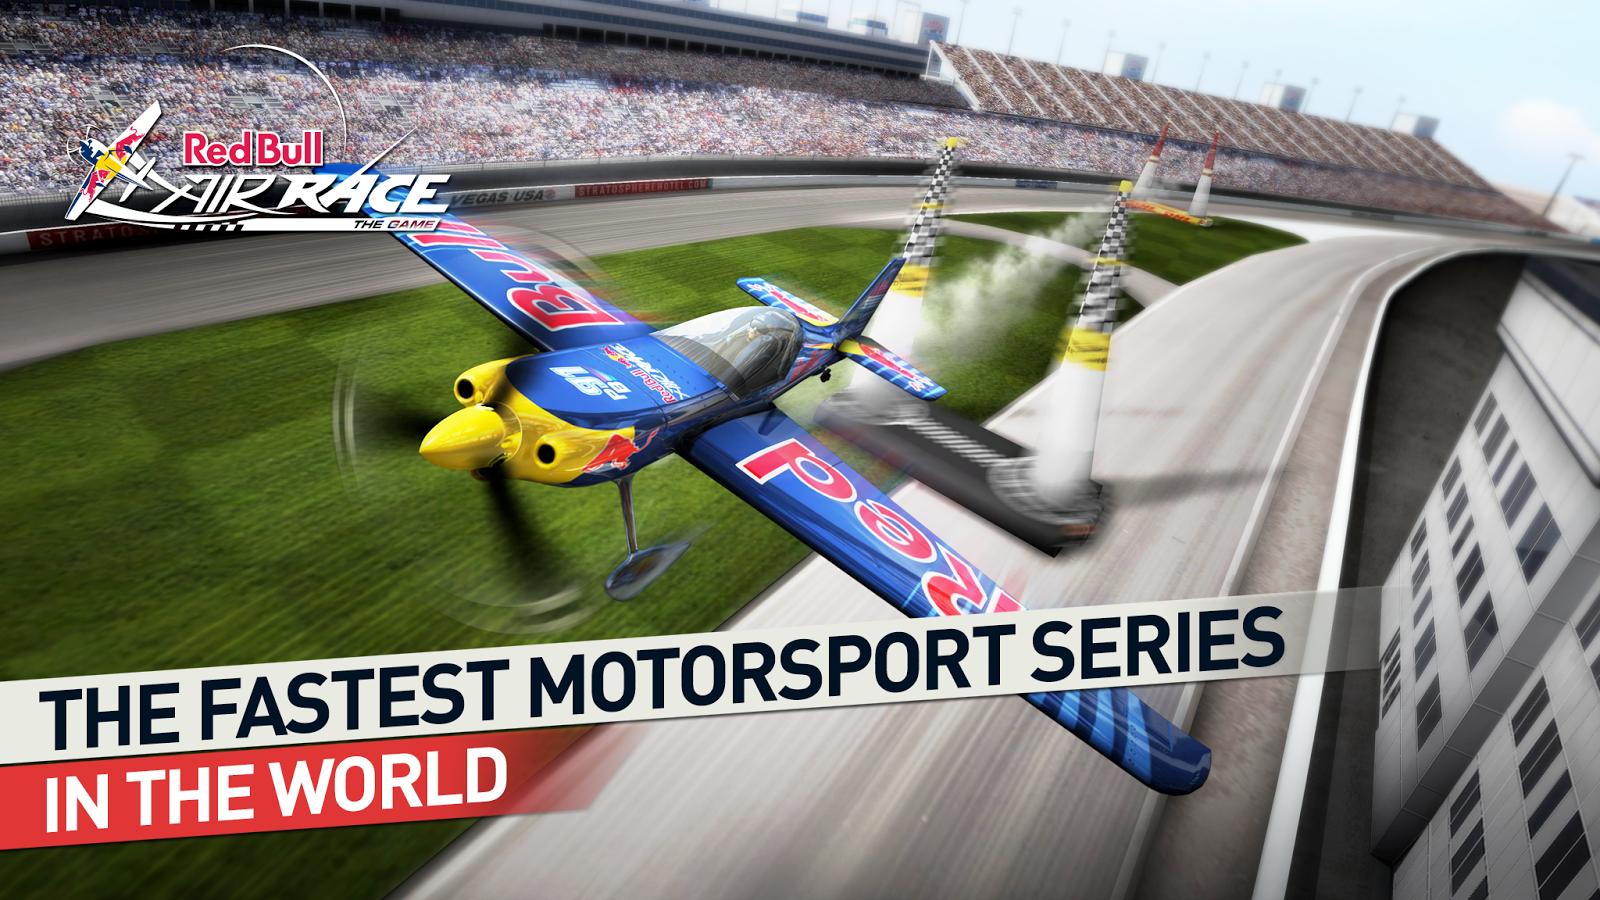 Vyzkoušejte letecké závody v Red Bull Air Race The Game